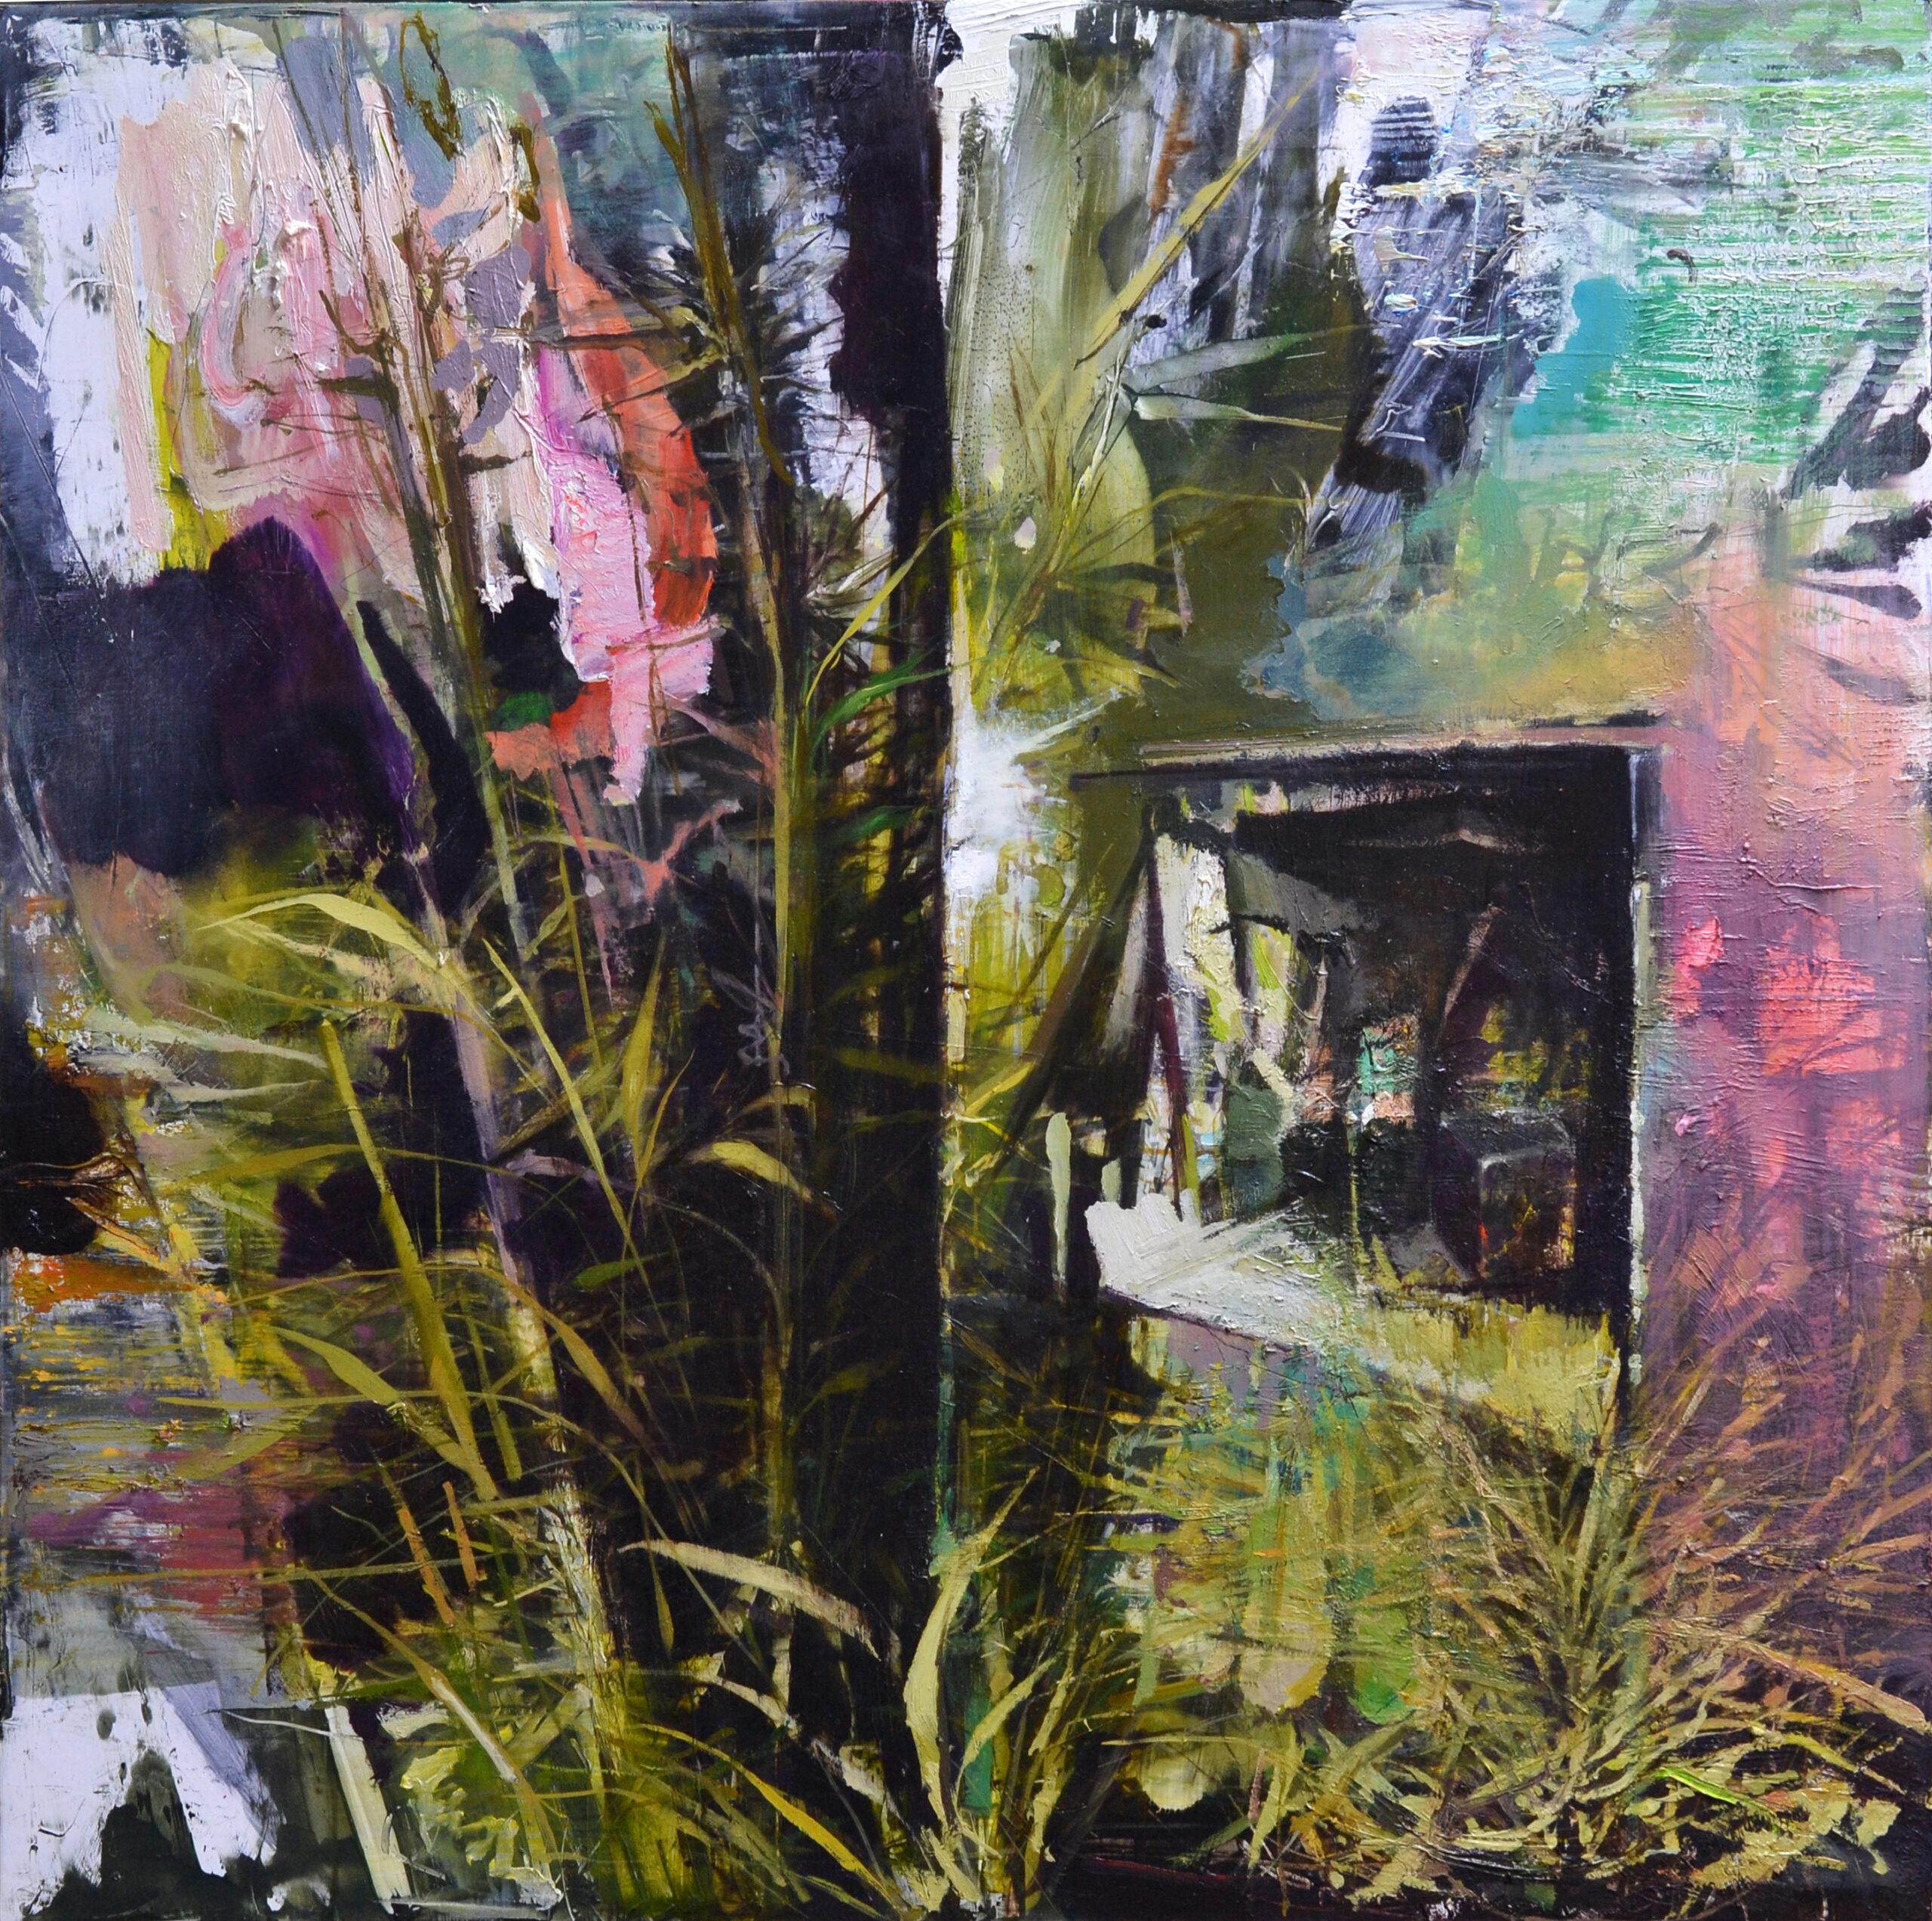 Heim des Grasmalers, 2020, 62x63 cm, Öl auf Alu